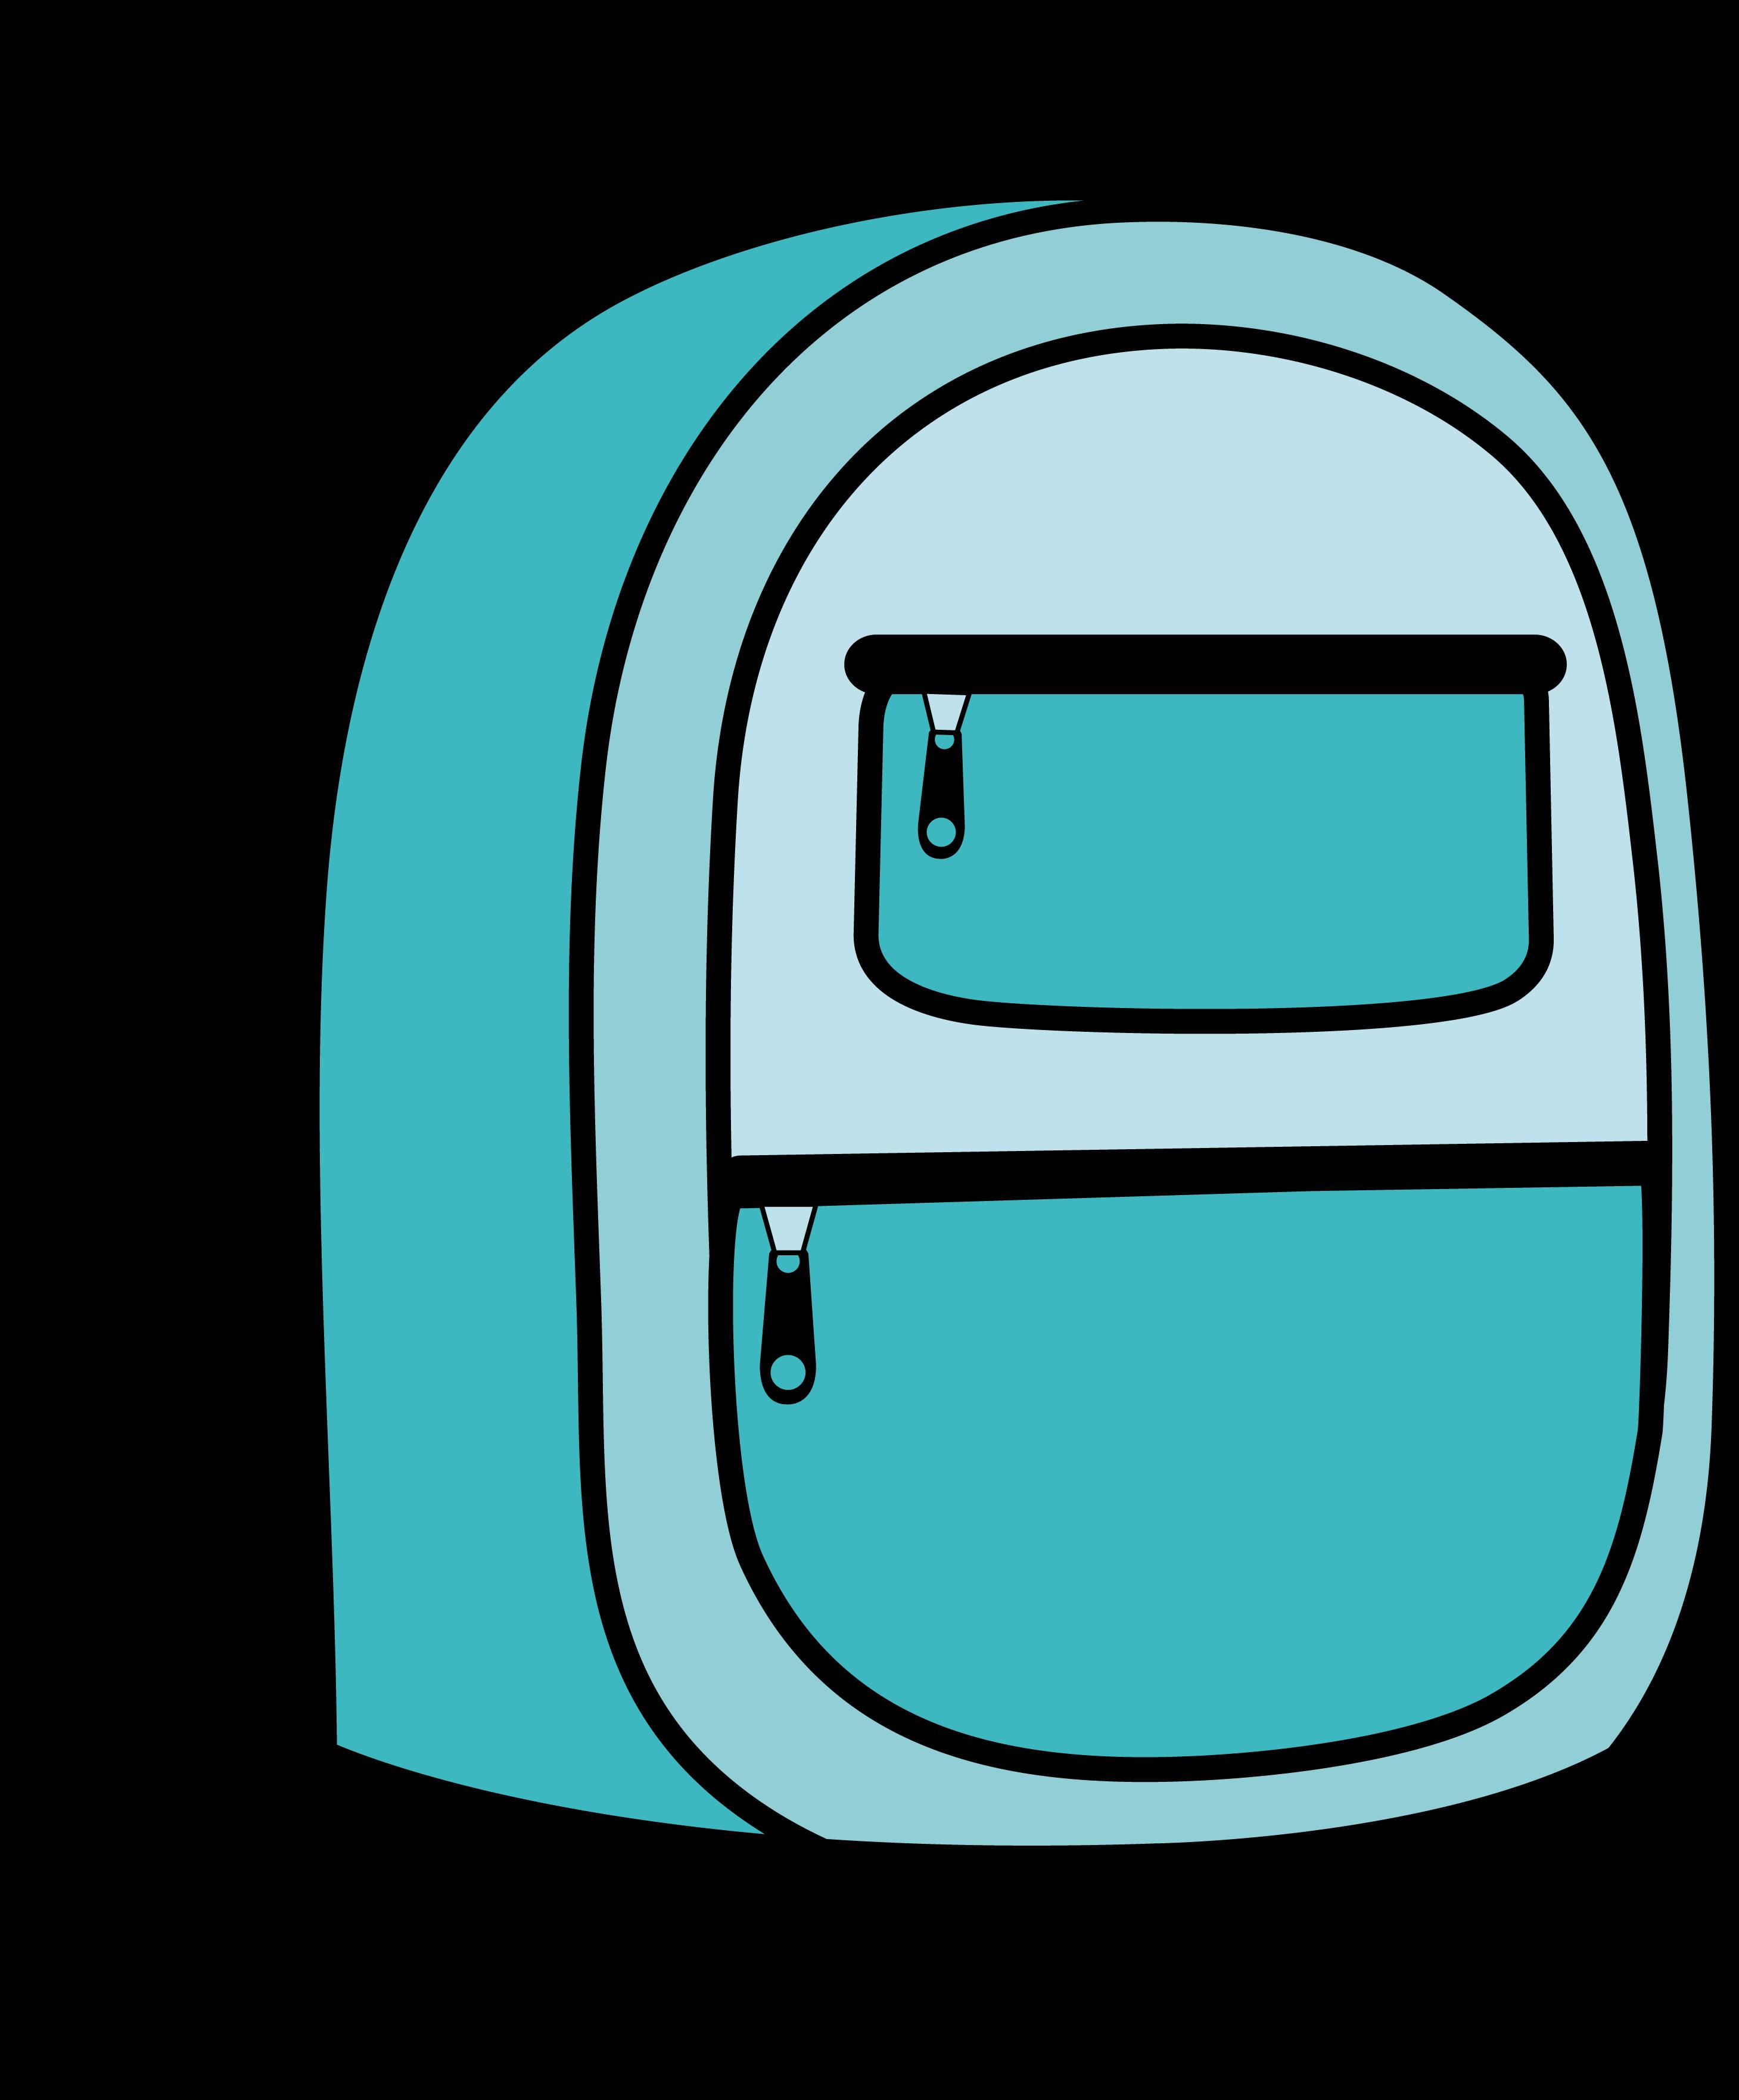 Bookbag clipart cartoon. Image result for backpack